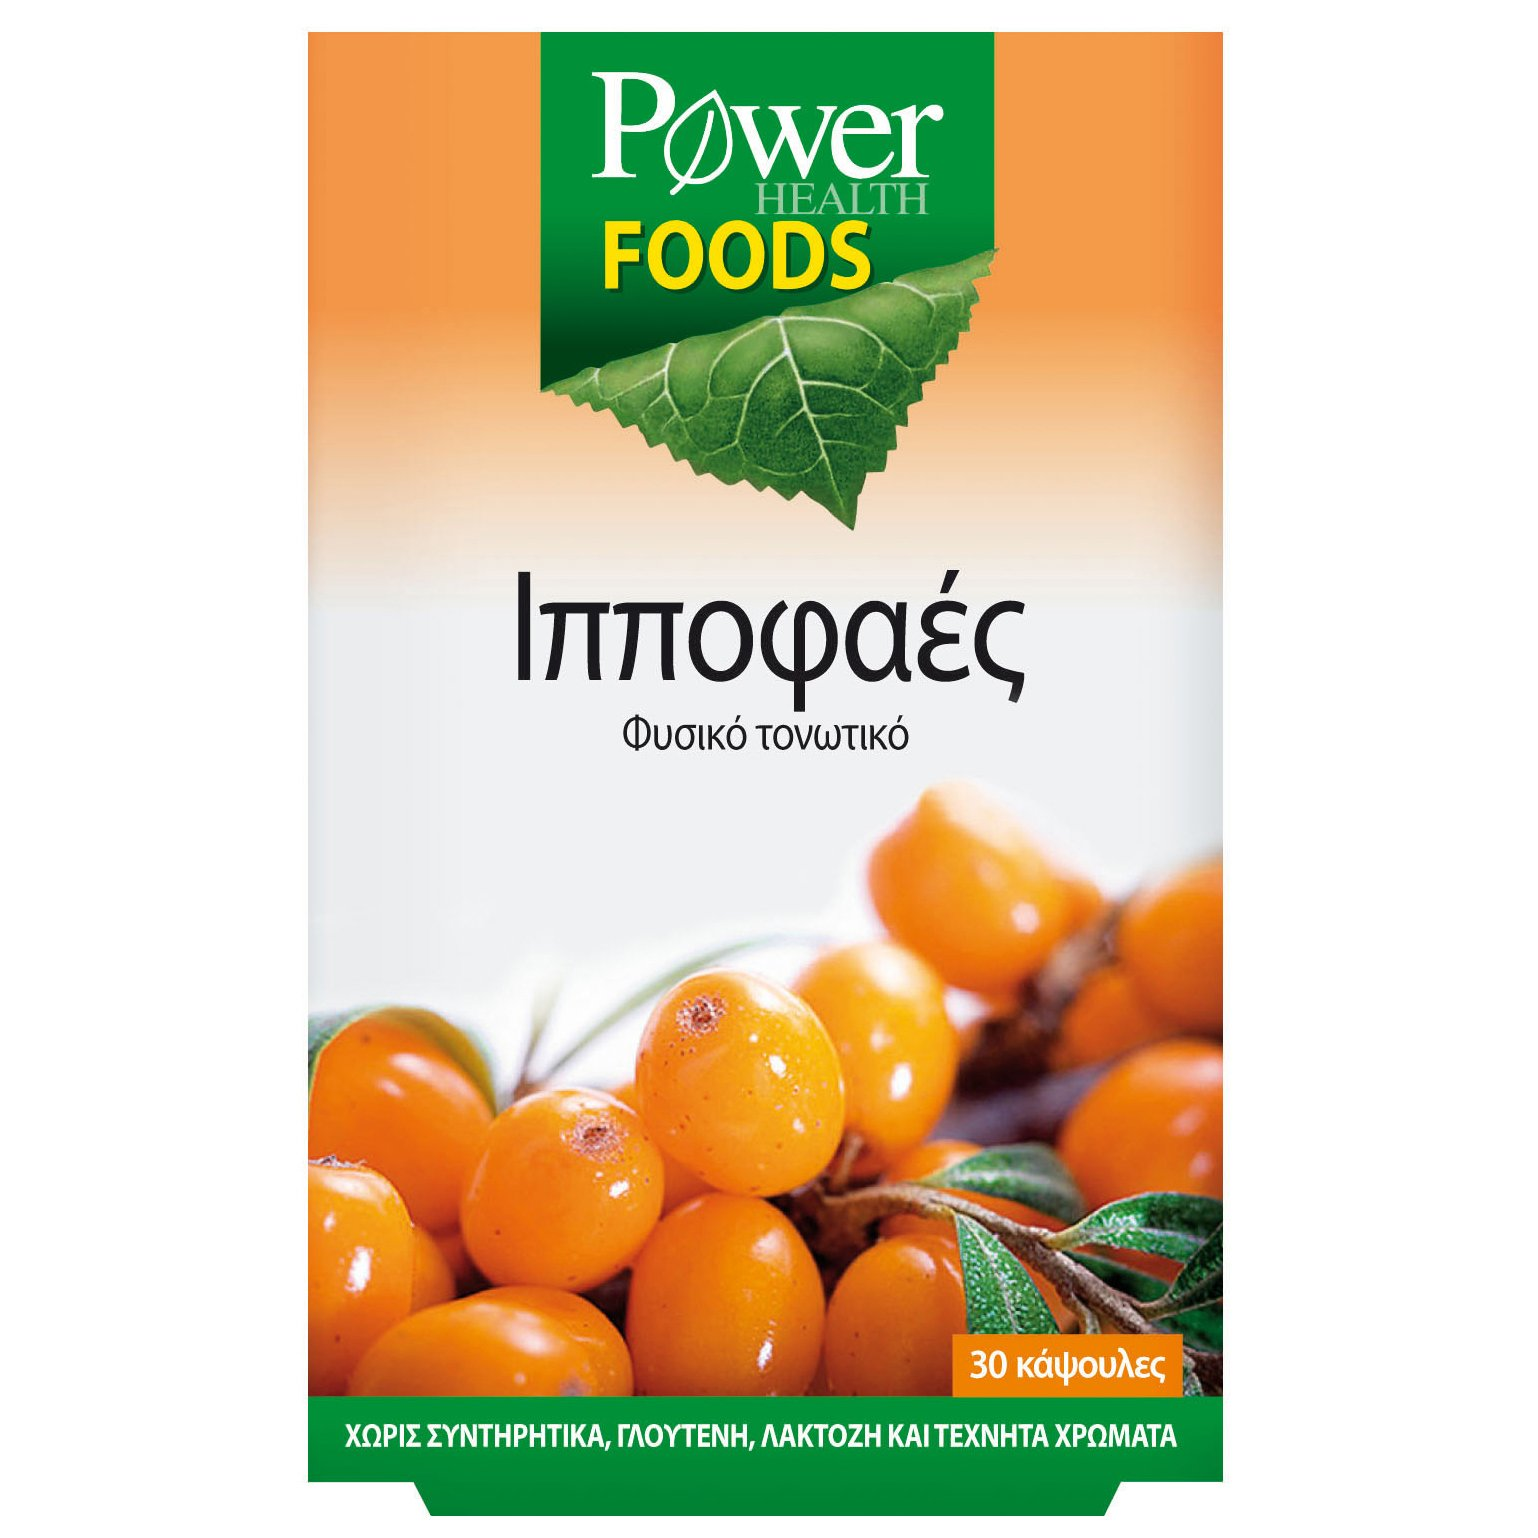 Power Health Power Foods Ιπποφαές Πολυτονωτικό Συμπλήρωμα Διατροφής 30caps